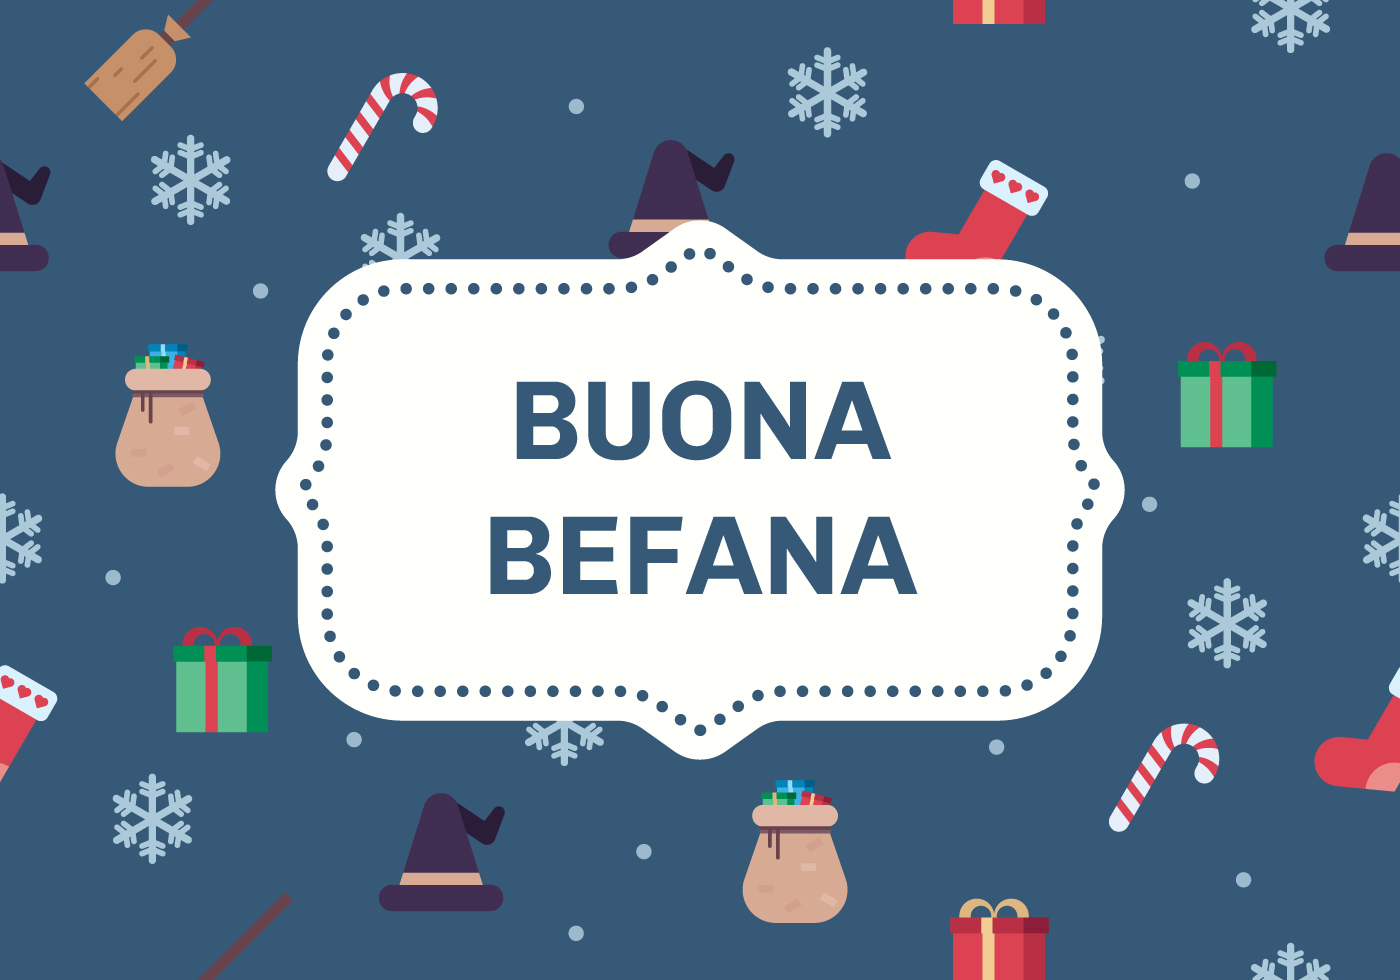 Buona Befana Greeting Card Download Free Vector Art Stock